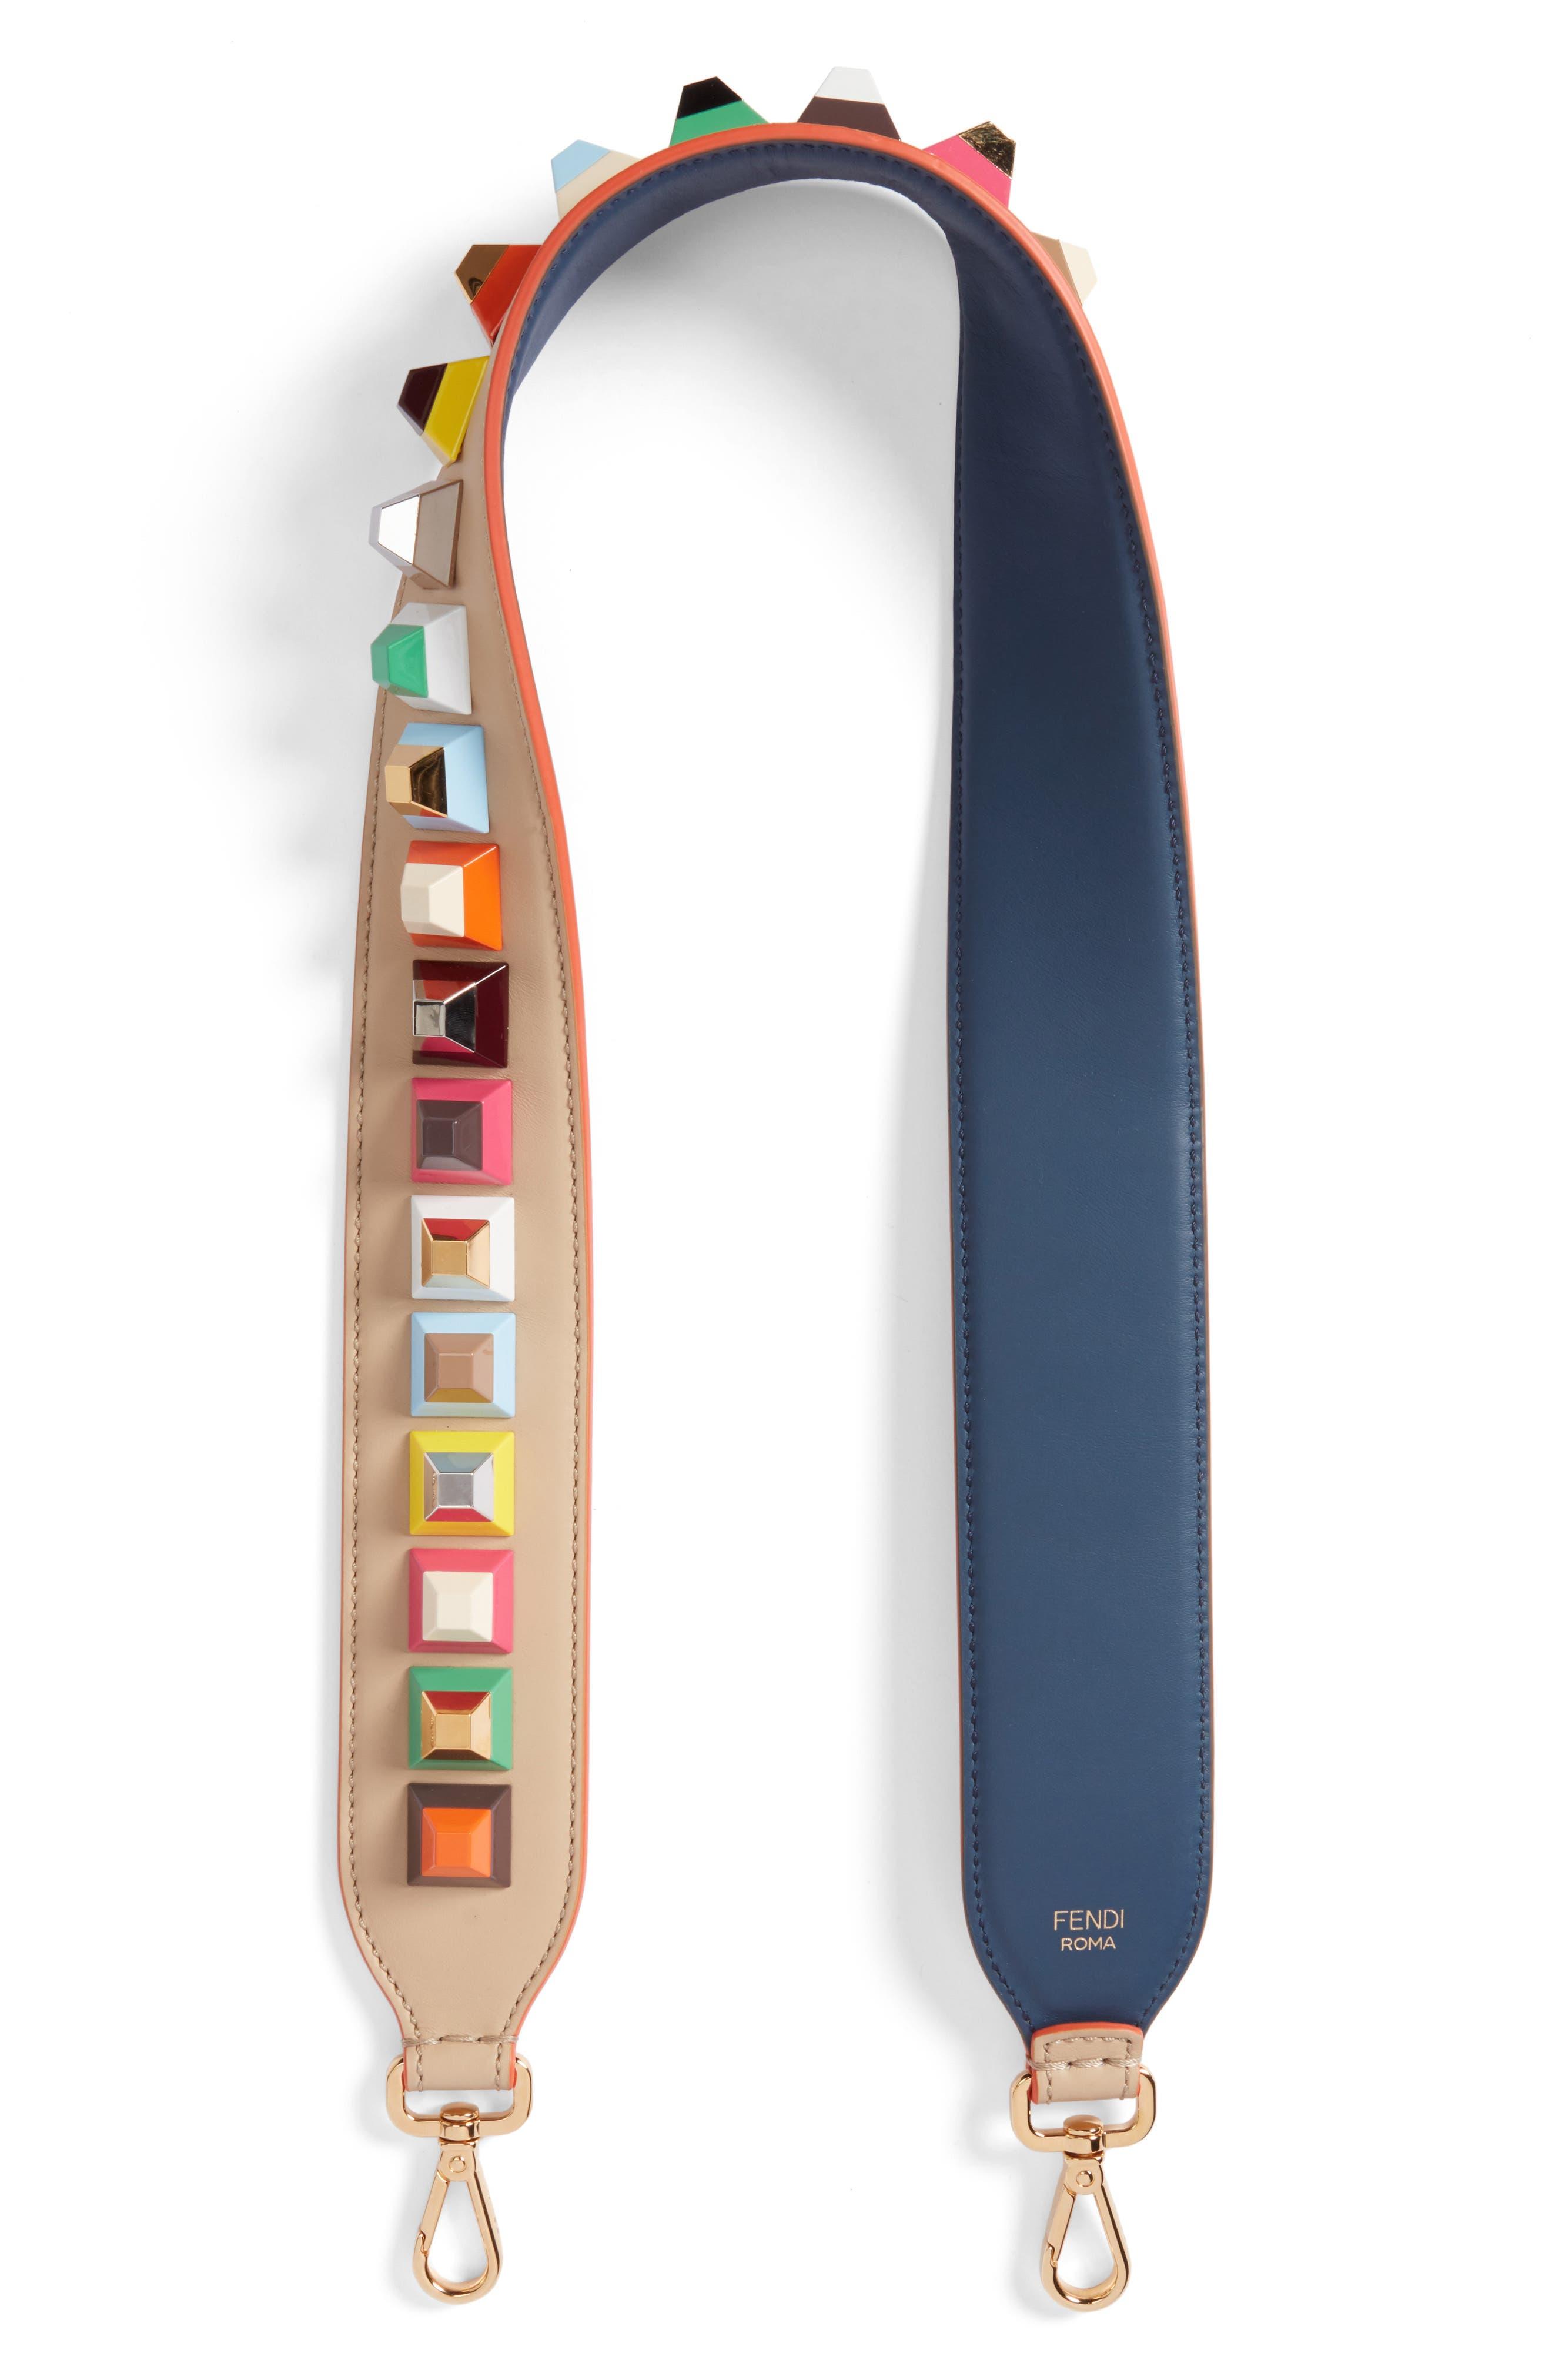 Fendi studded leather guitar style bag strap nordstrom jpg 1660x1783 Guitar  strap fendi d014377495